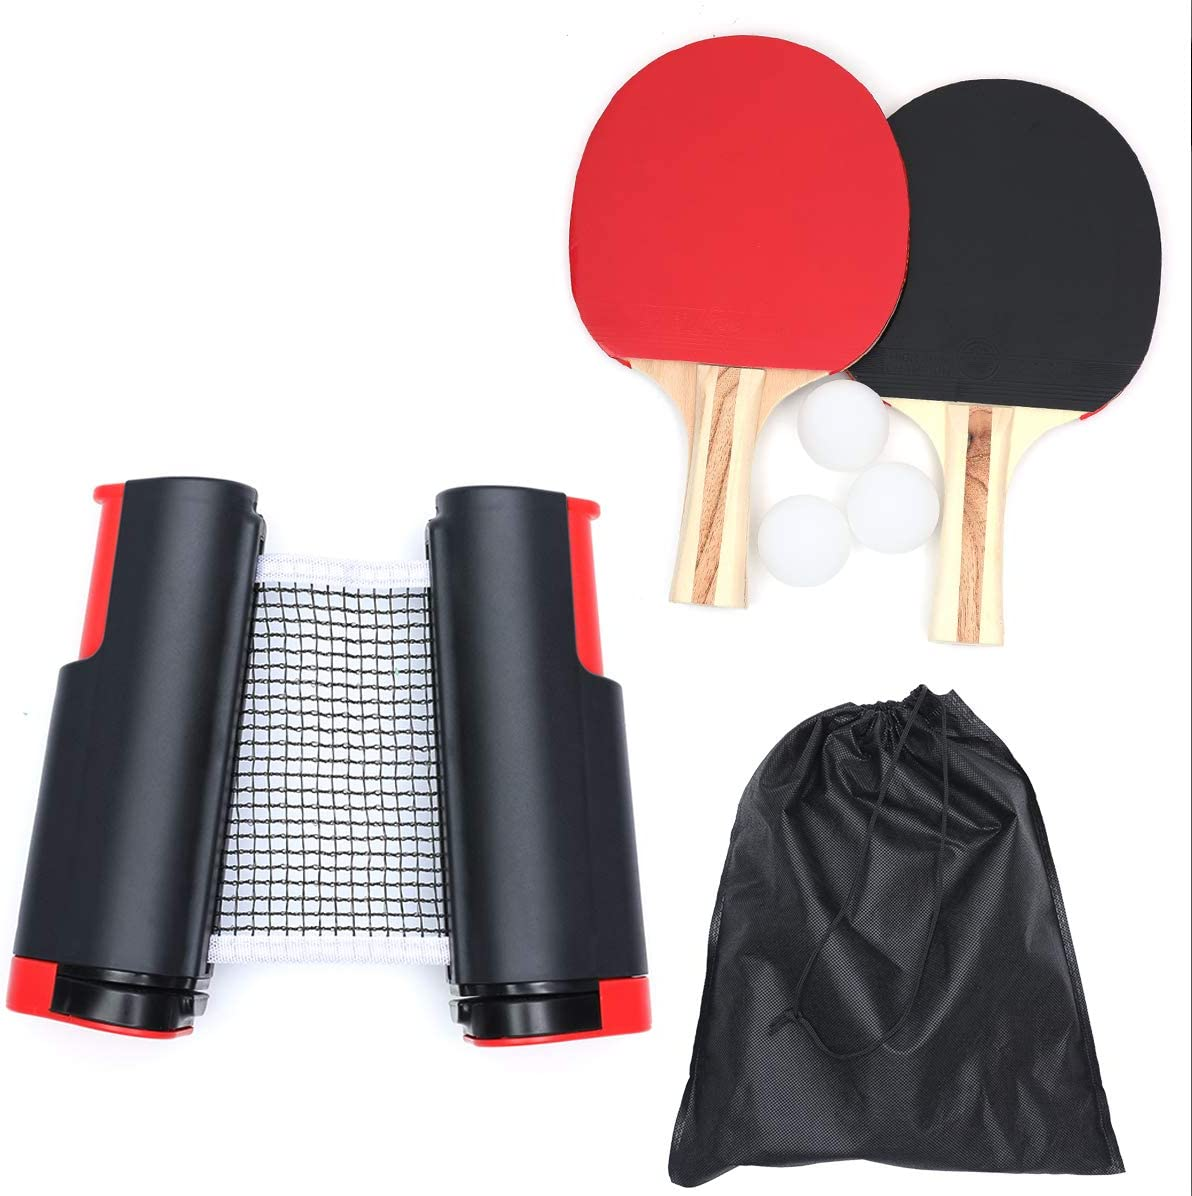 Set de Ping Pong - Juego de Red de Tenis de Mesa,Conjunto de Pingpong Set Portátil, 2 Raquetas de Tenis de Mesa, 3 Pelotas de Ping Pong, Bolsa de Almacenamiento Portátil, Retráctil Mesa Ping Pong